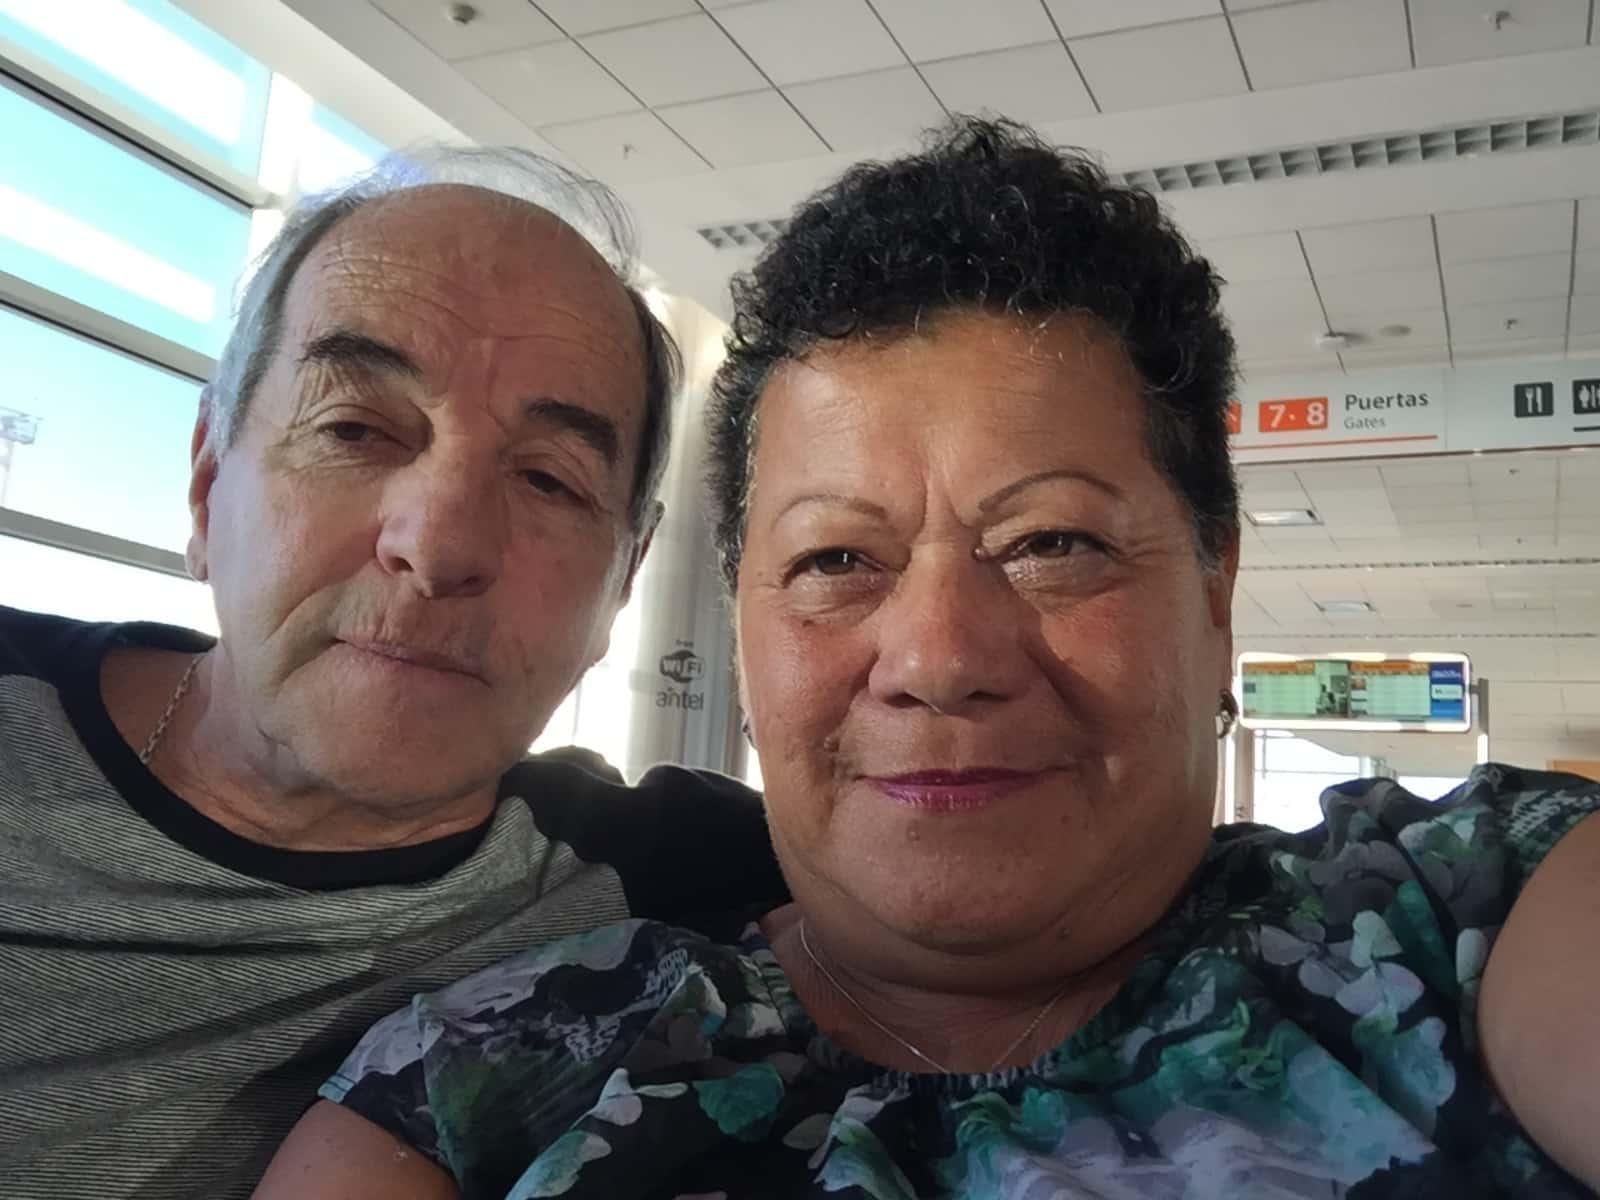 Dimar & Julio from Toronto, Ontario, Canada